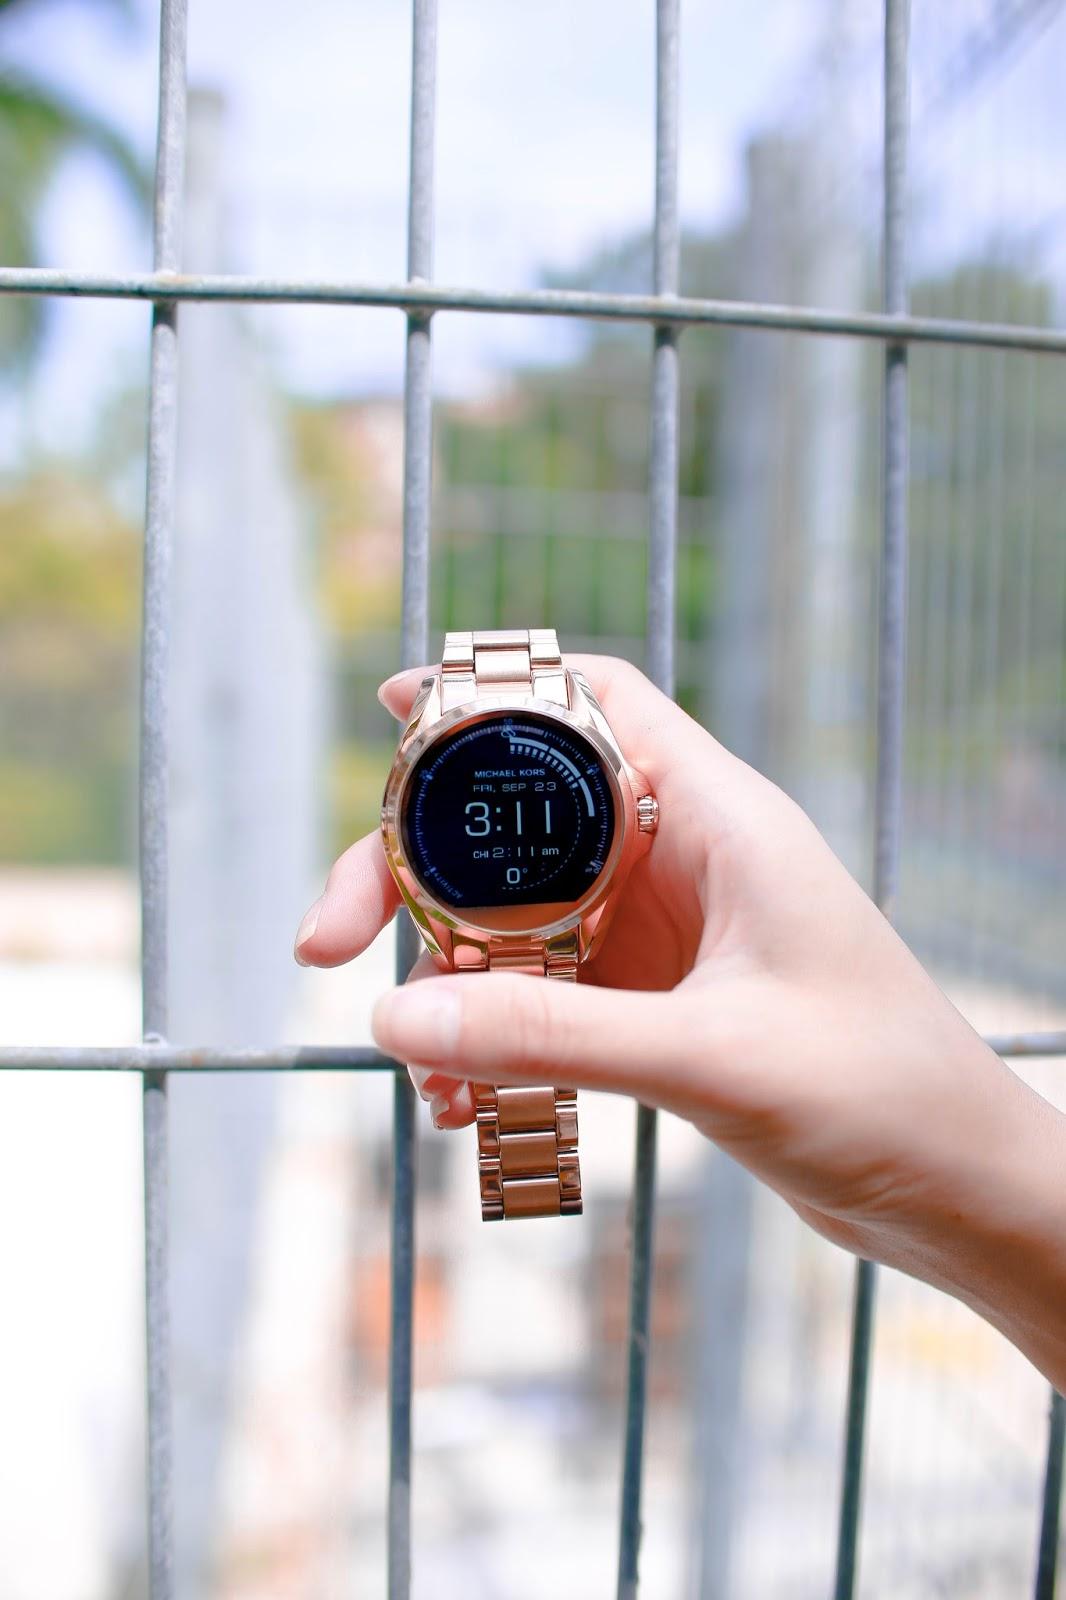 michaelkors, access, smartwatch, google fit, fitness, function,